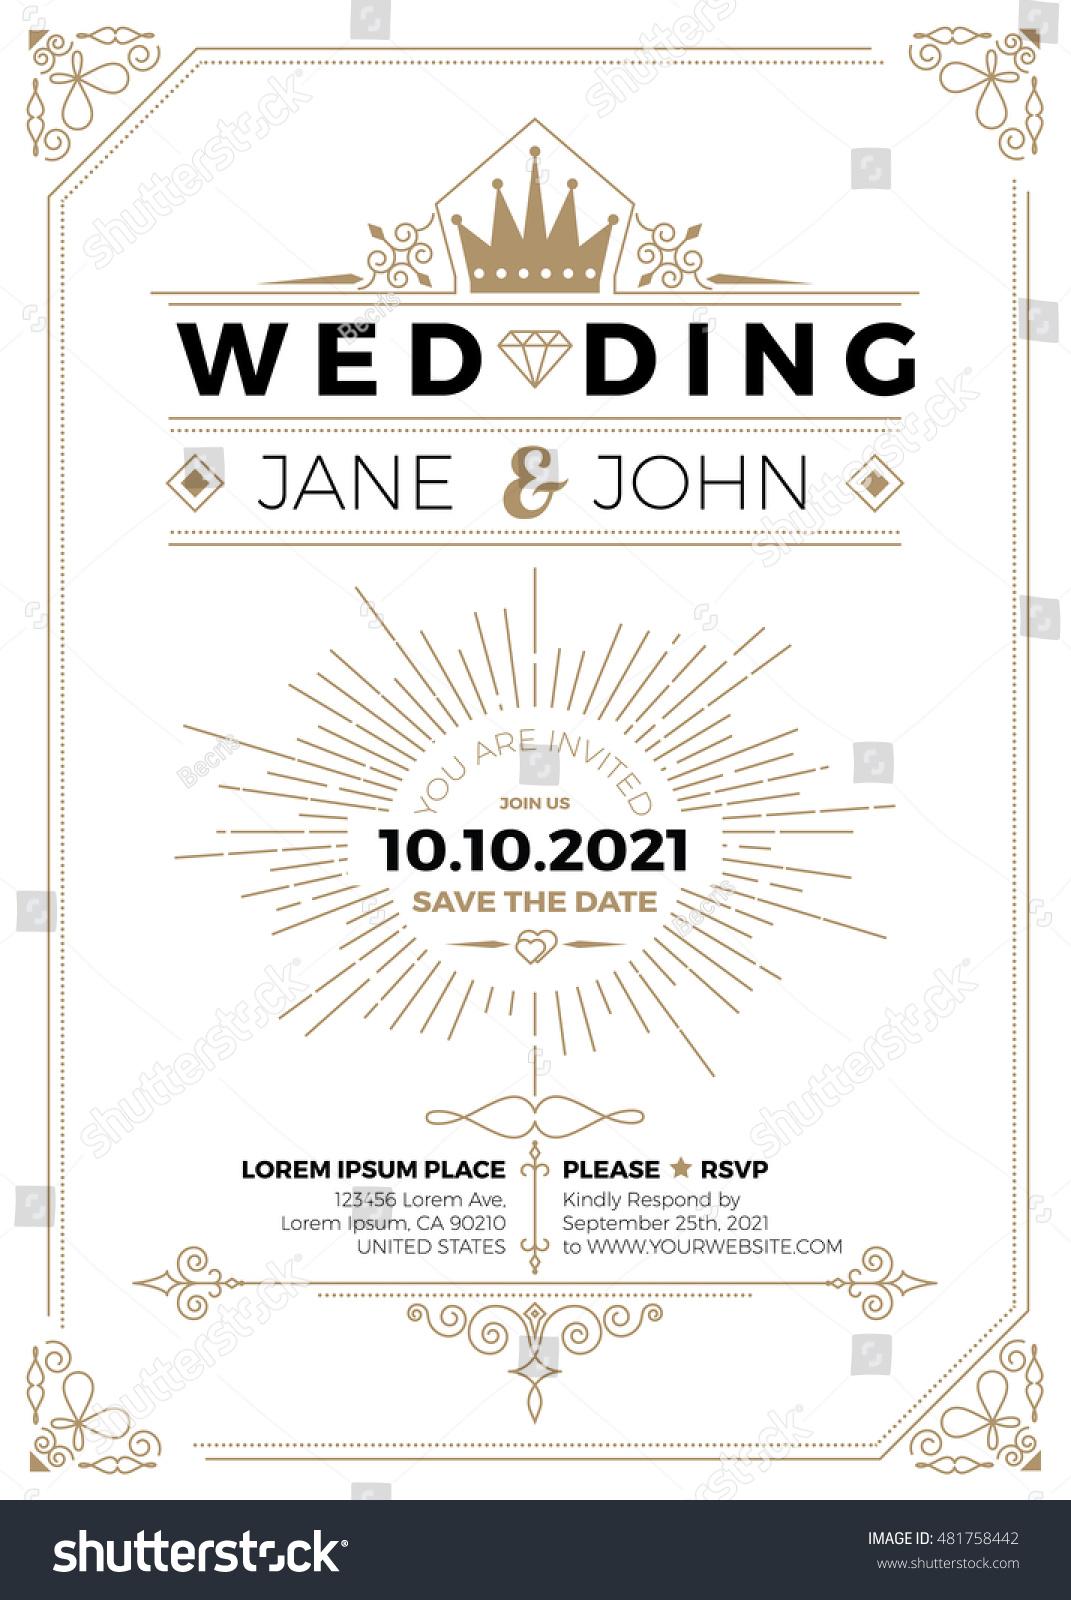 Vintage Wedding Invitation Card A5 Size Frame Layout Print Template